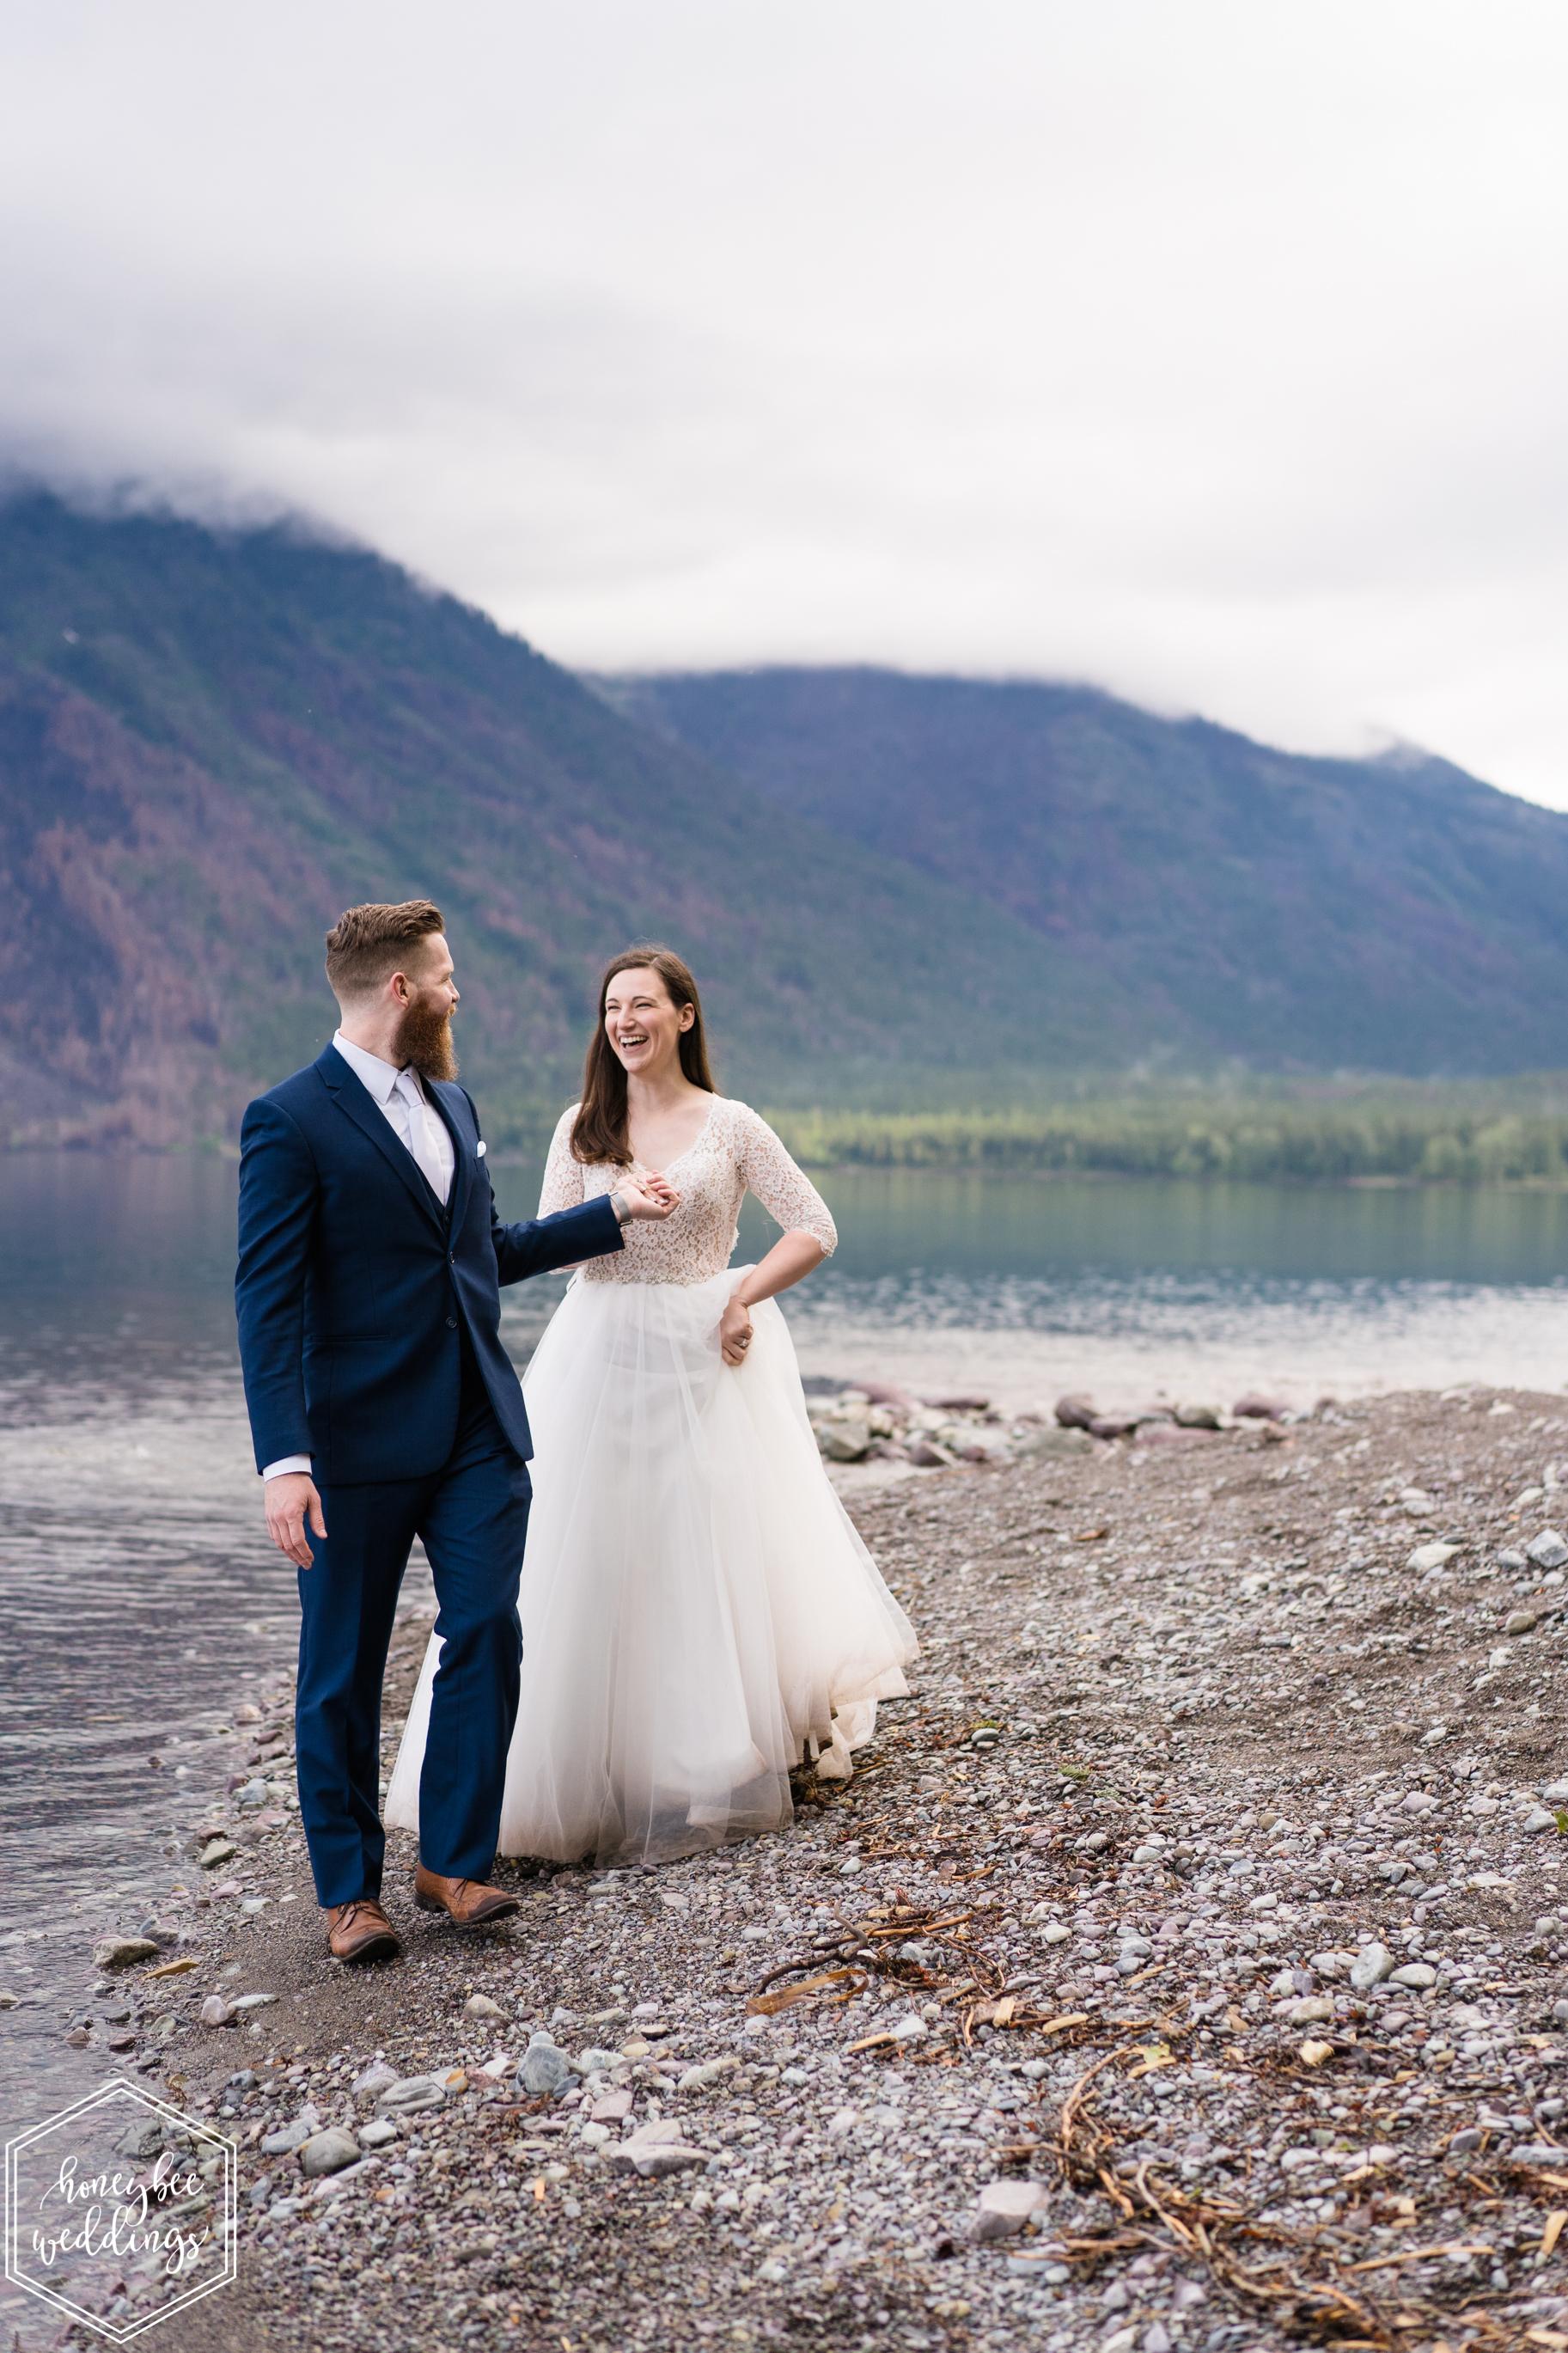 293Glacier National Park Wedding_Izaak Walton Inn Wedding_Honeybee Weddings_Norah & Kyle_June 09, 2019-155.jpg